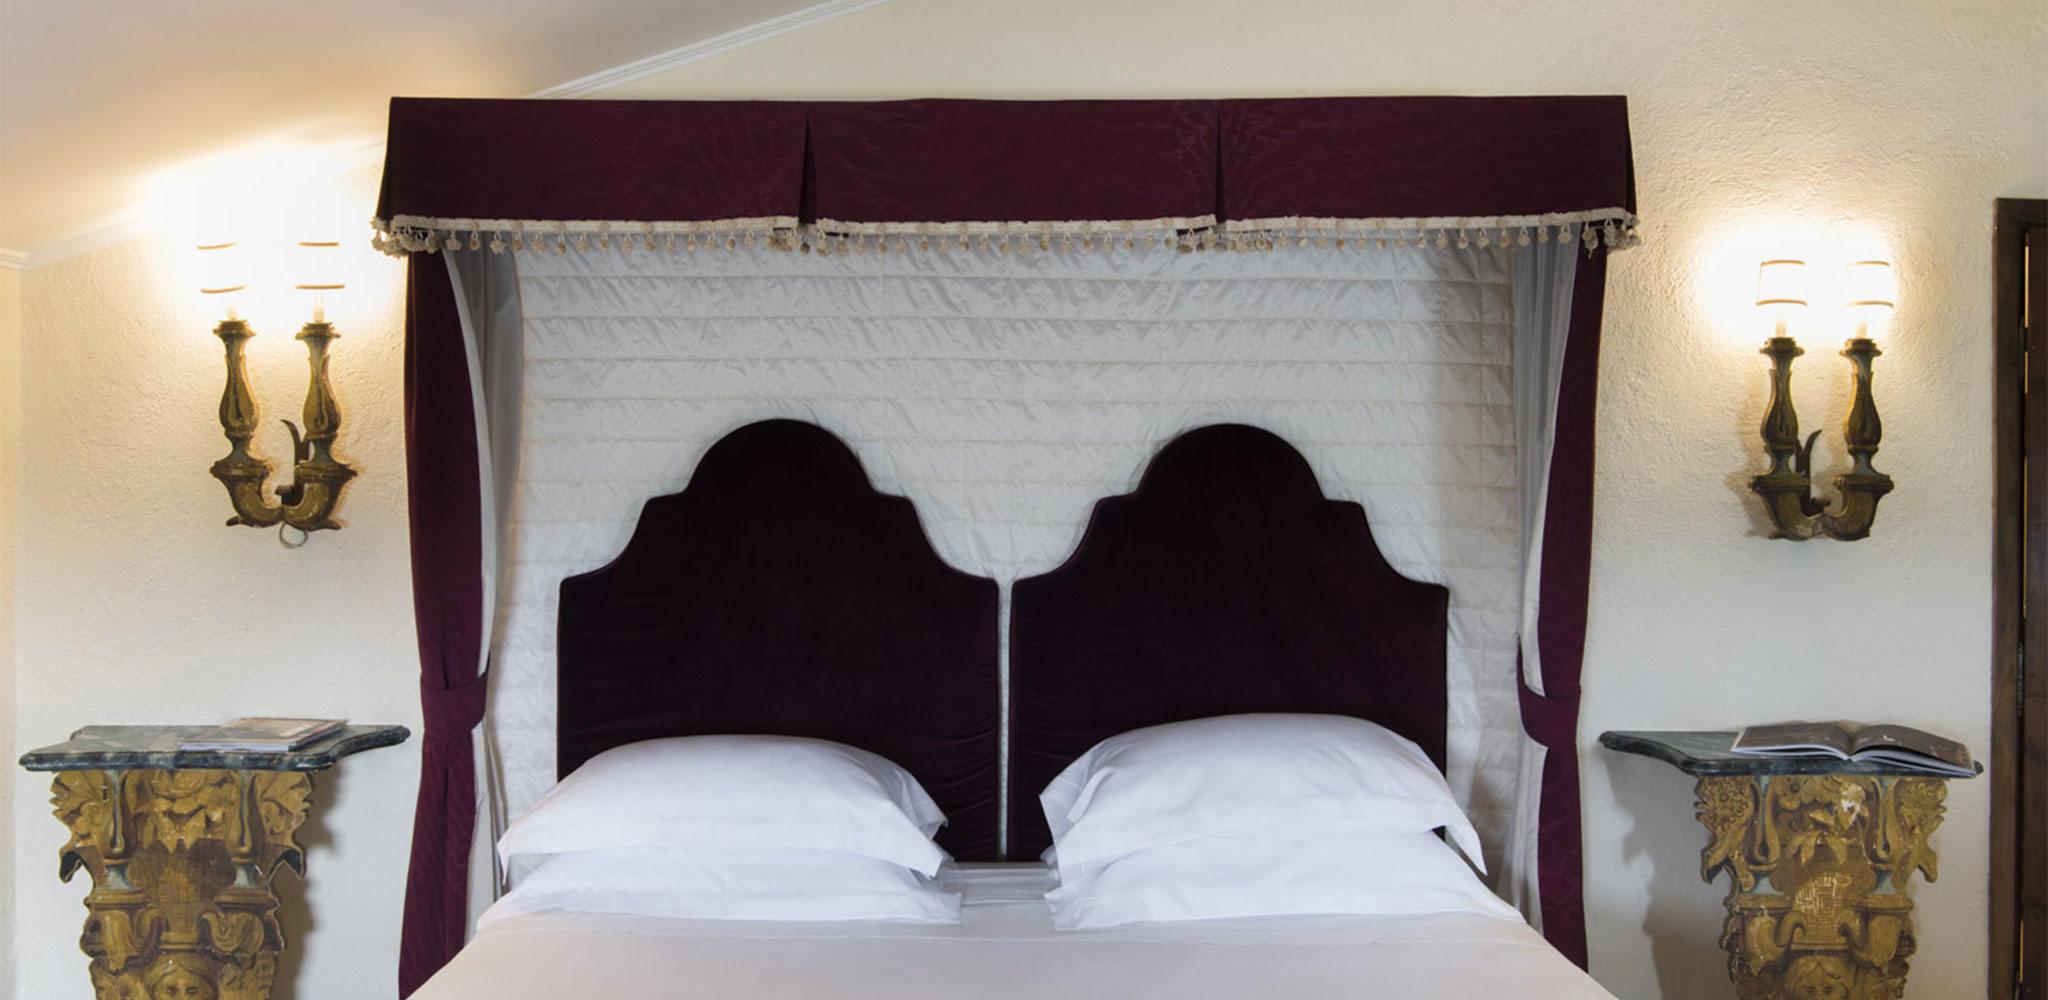 luxury-hotel-in-ladispoli-rome-la-posta-vecchia-401399